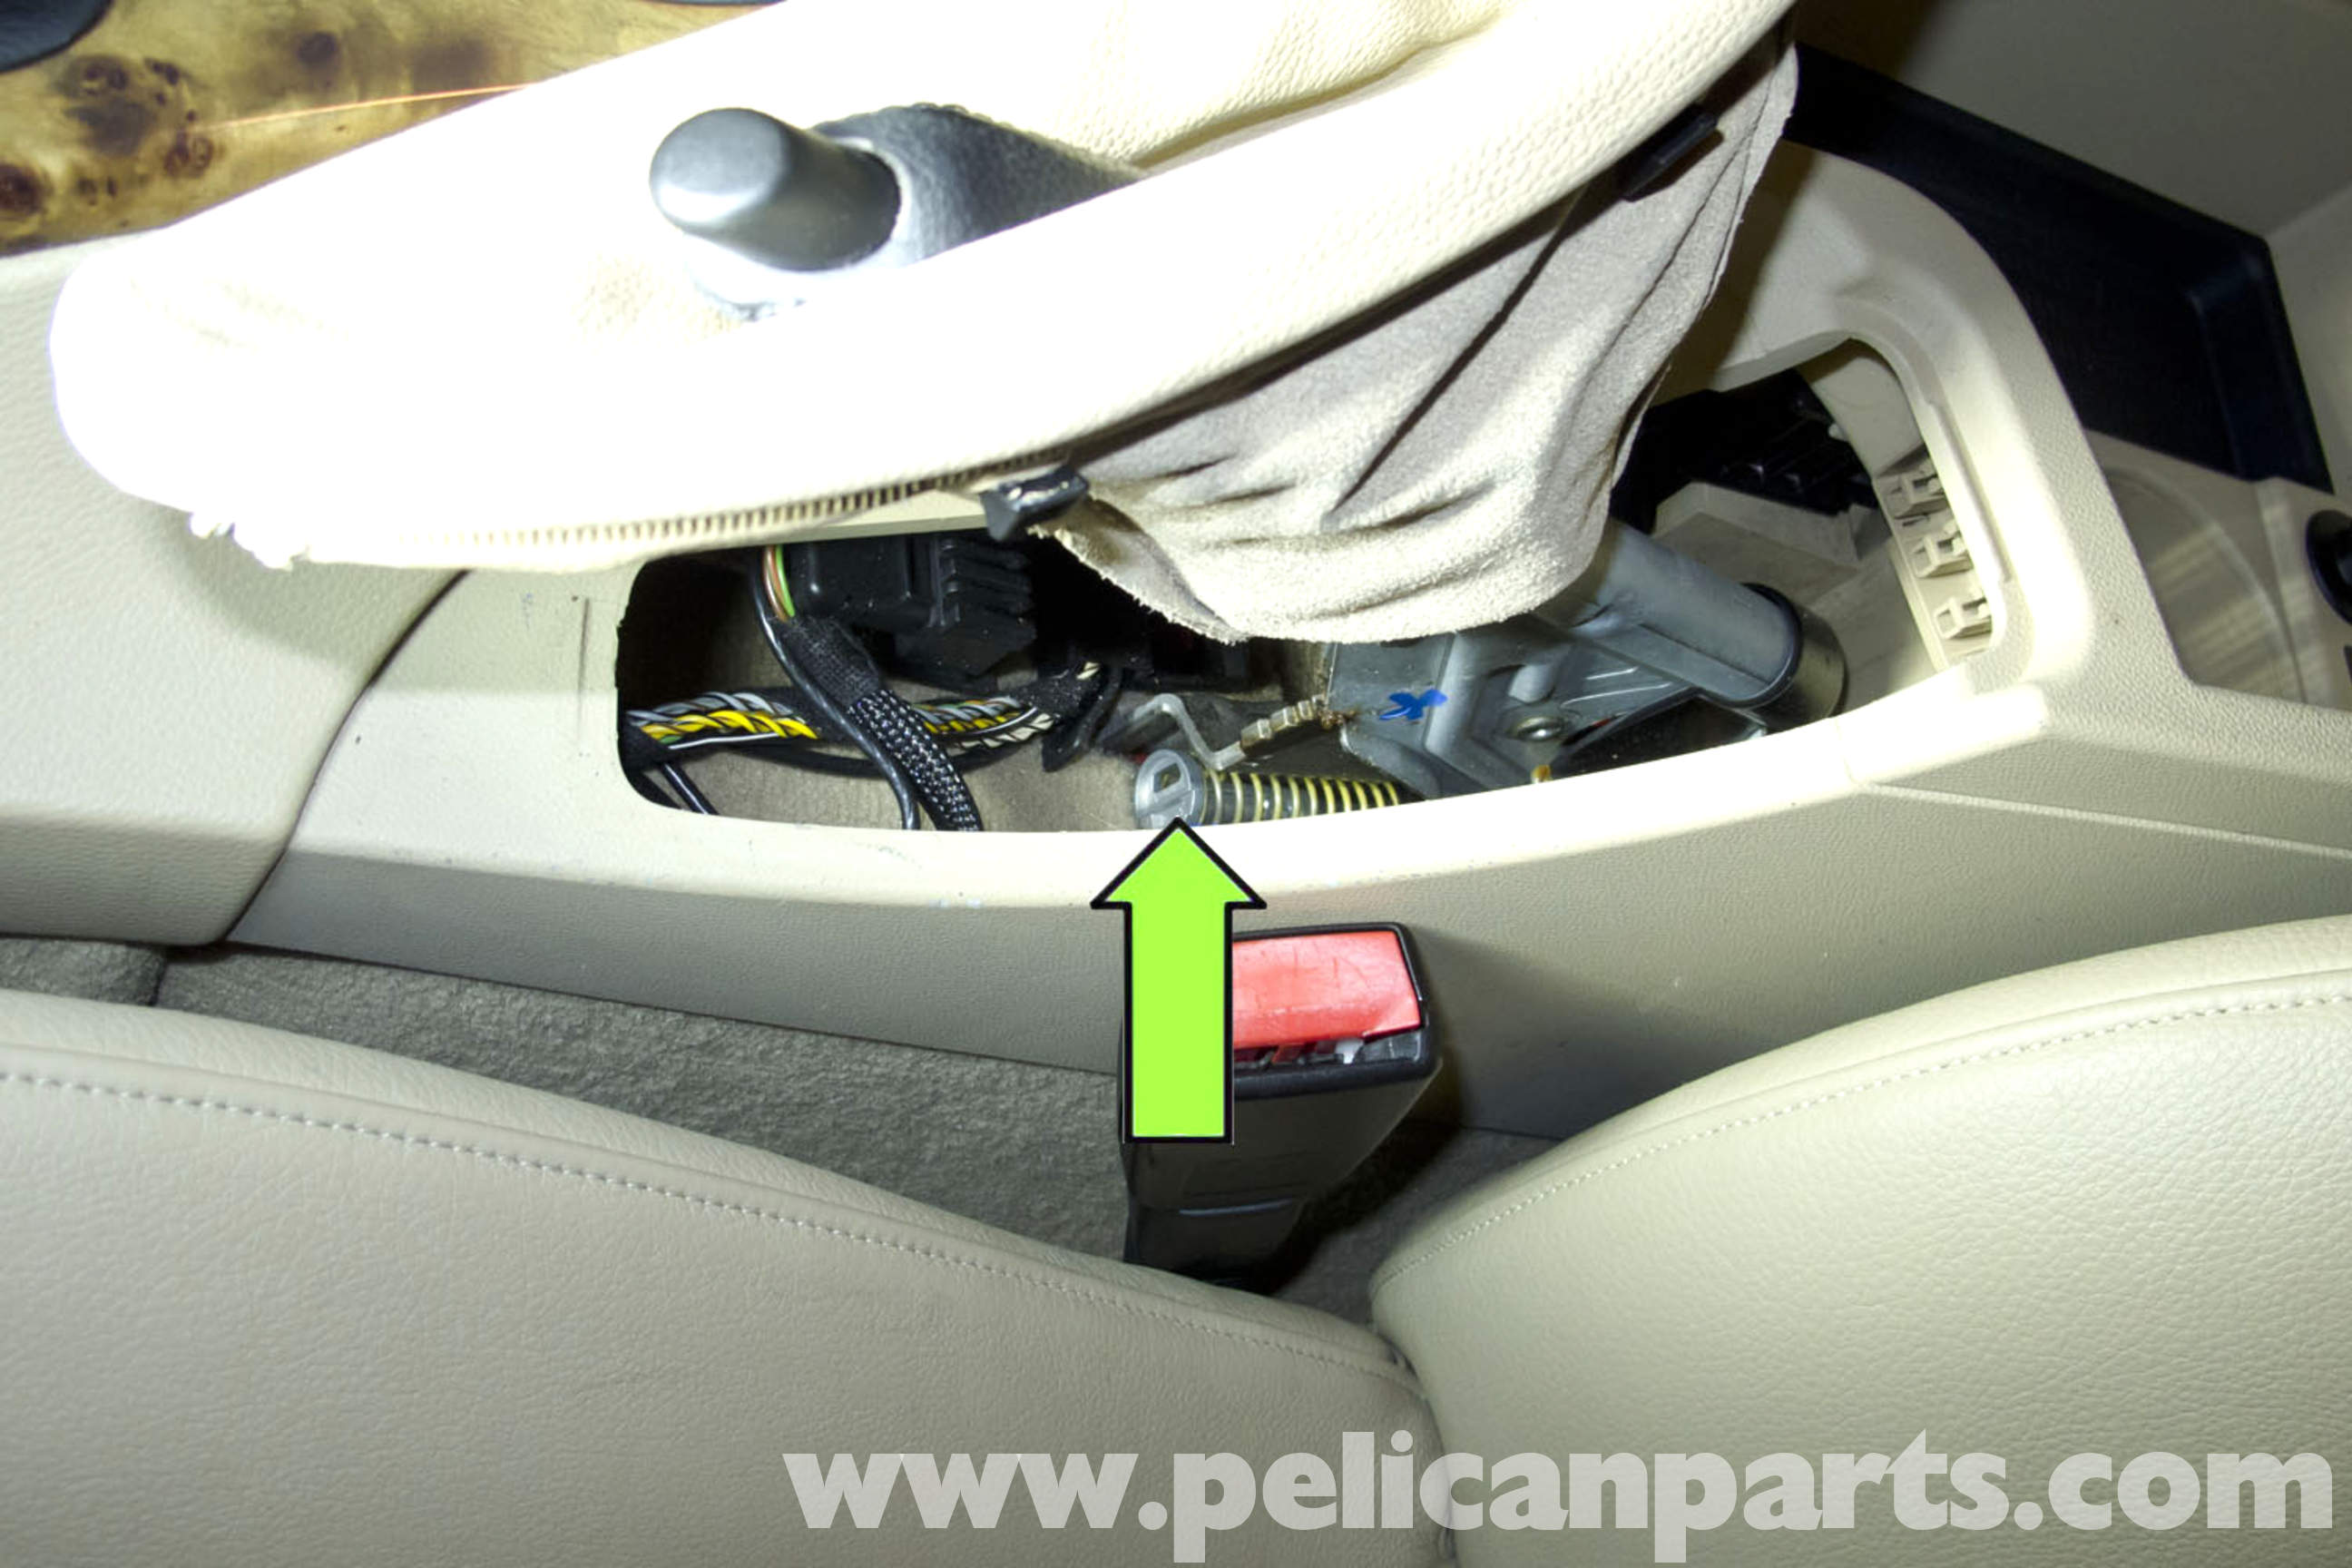 How to adjust the handbrake